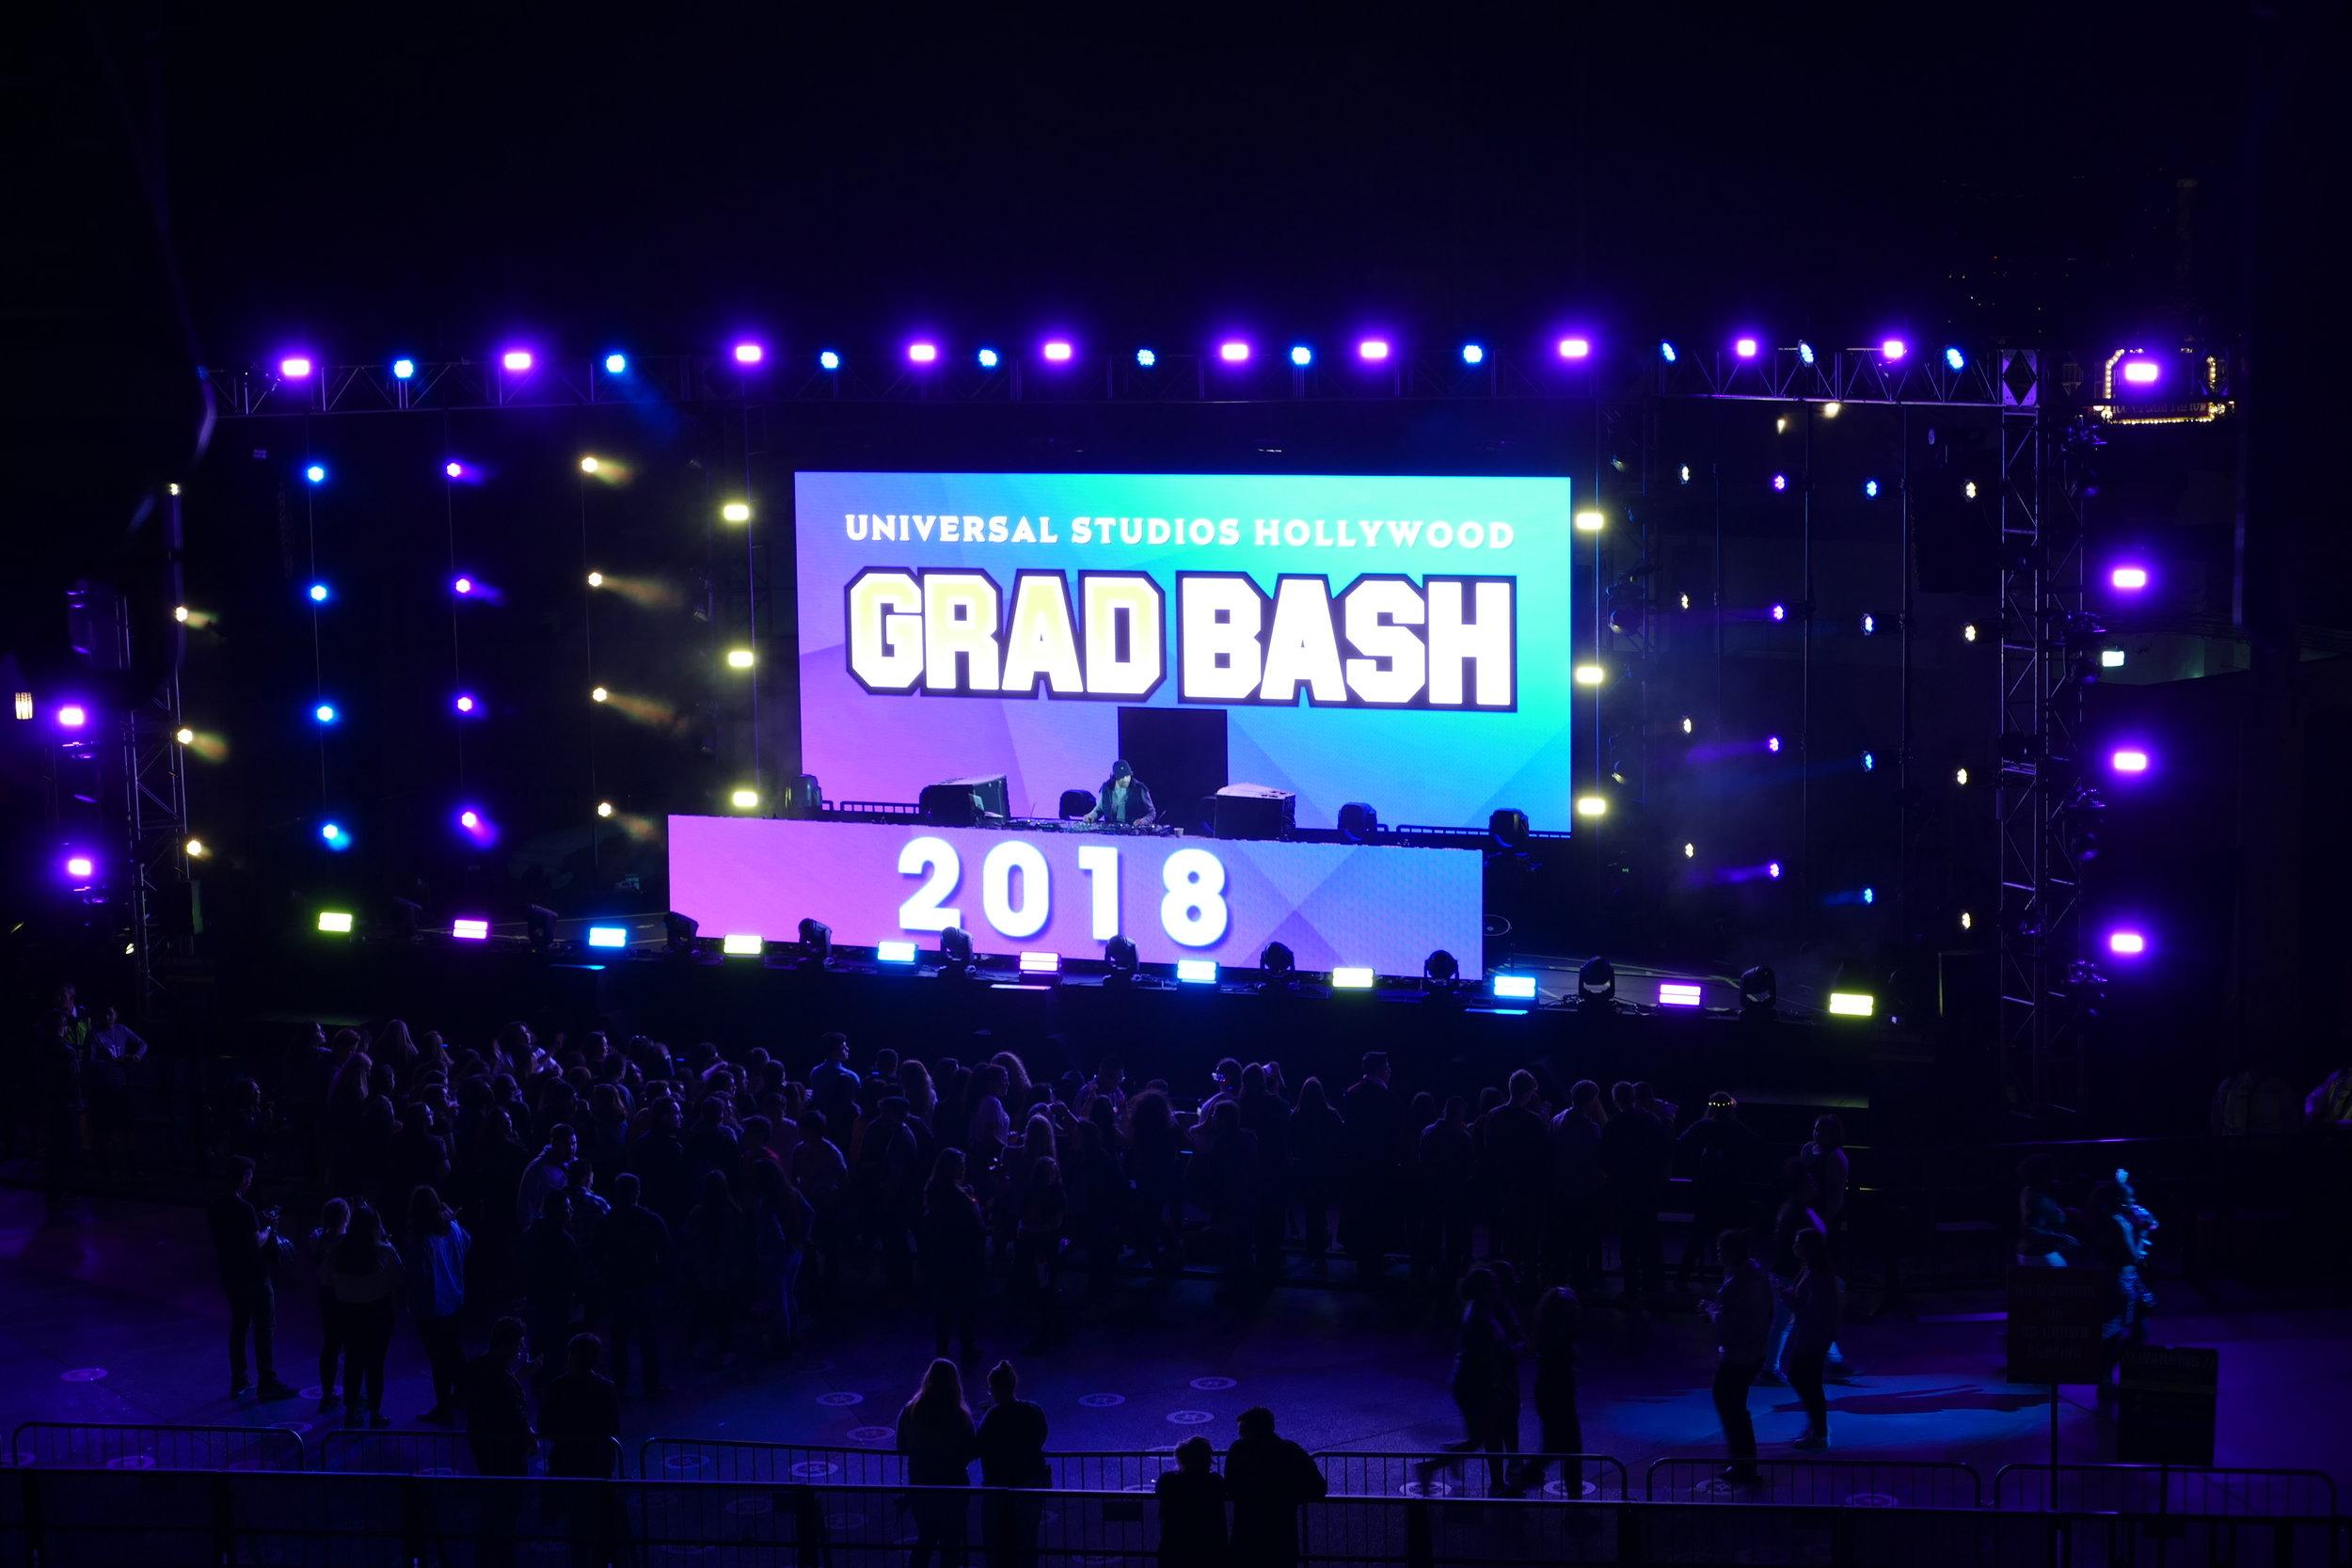 Grad Bash 2018 - Universal Studios Hollywood